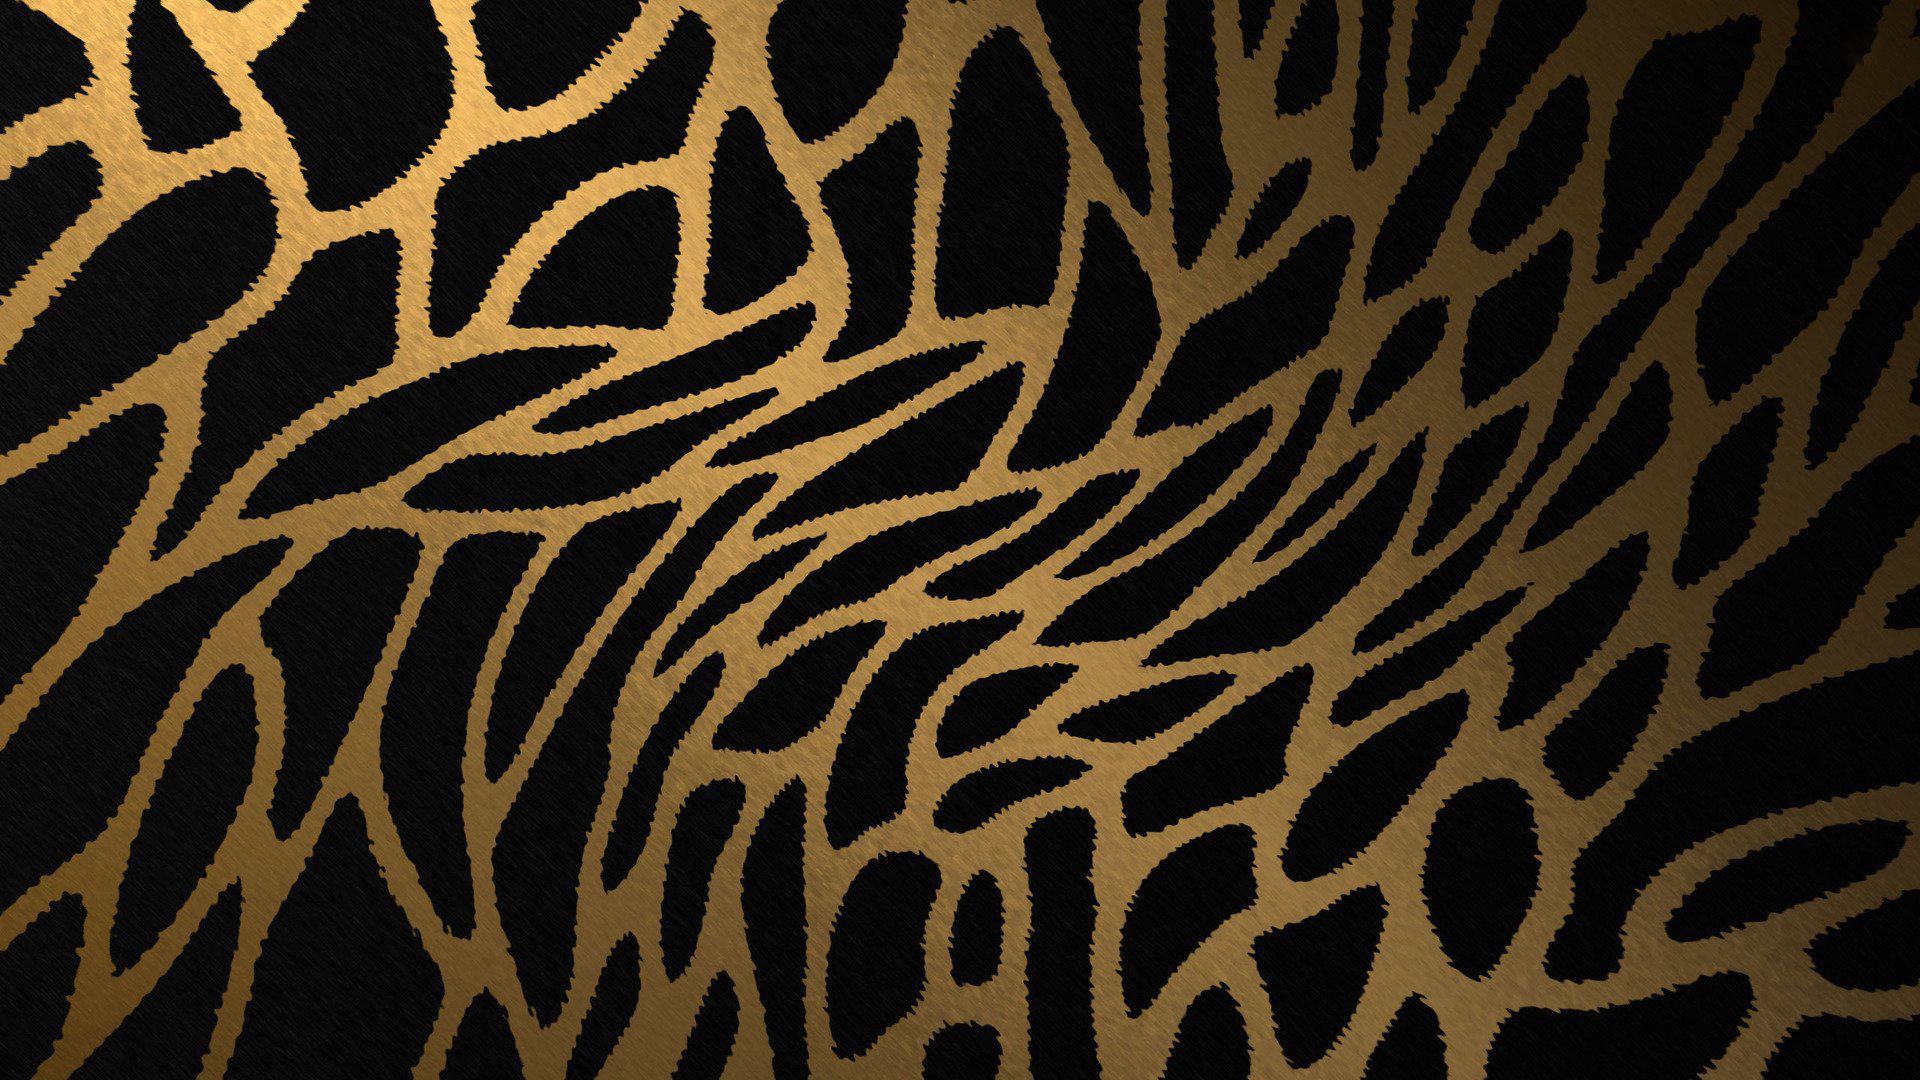 Tiger Print Wallpapers 11 Adorable